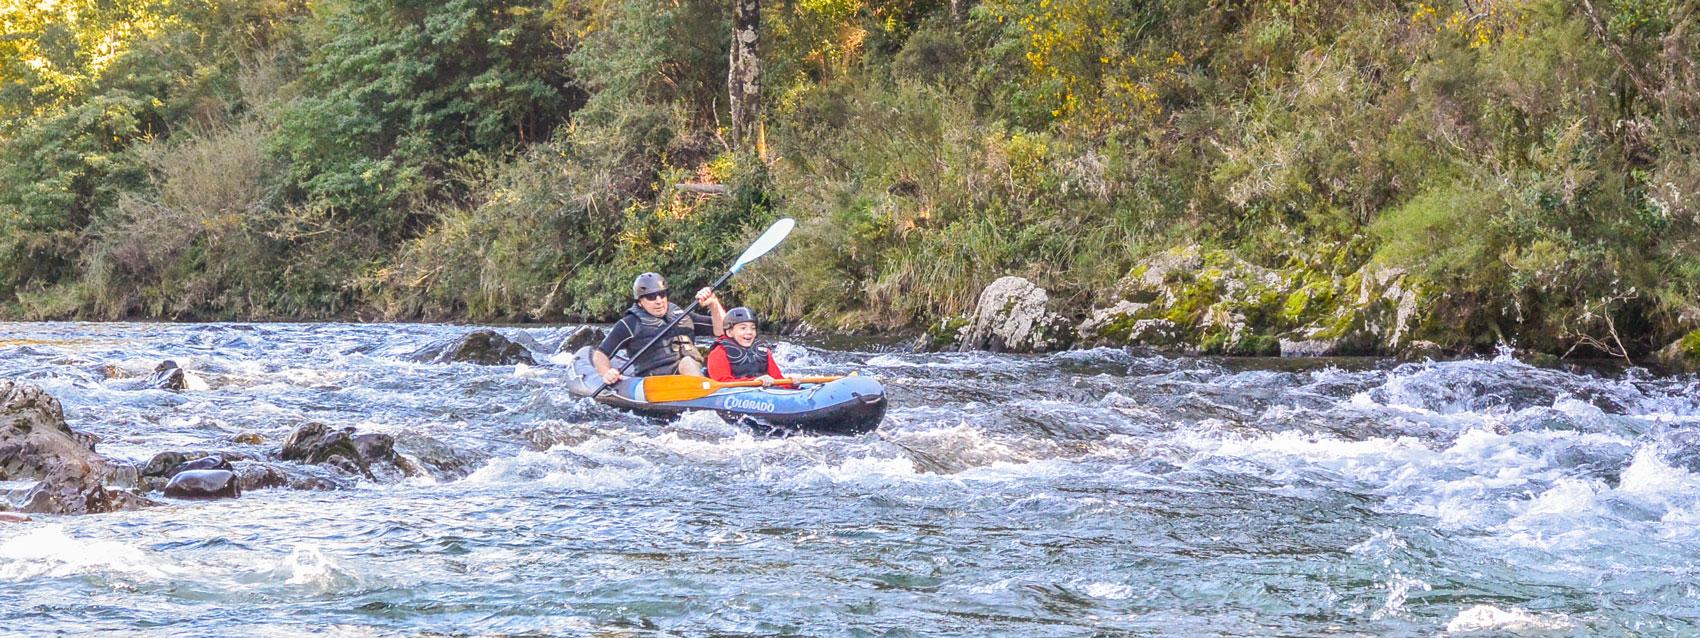 Hobbit kayak tour gallery banner September 2019